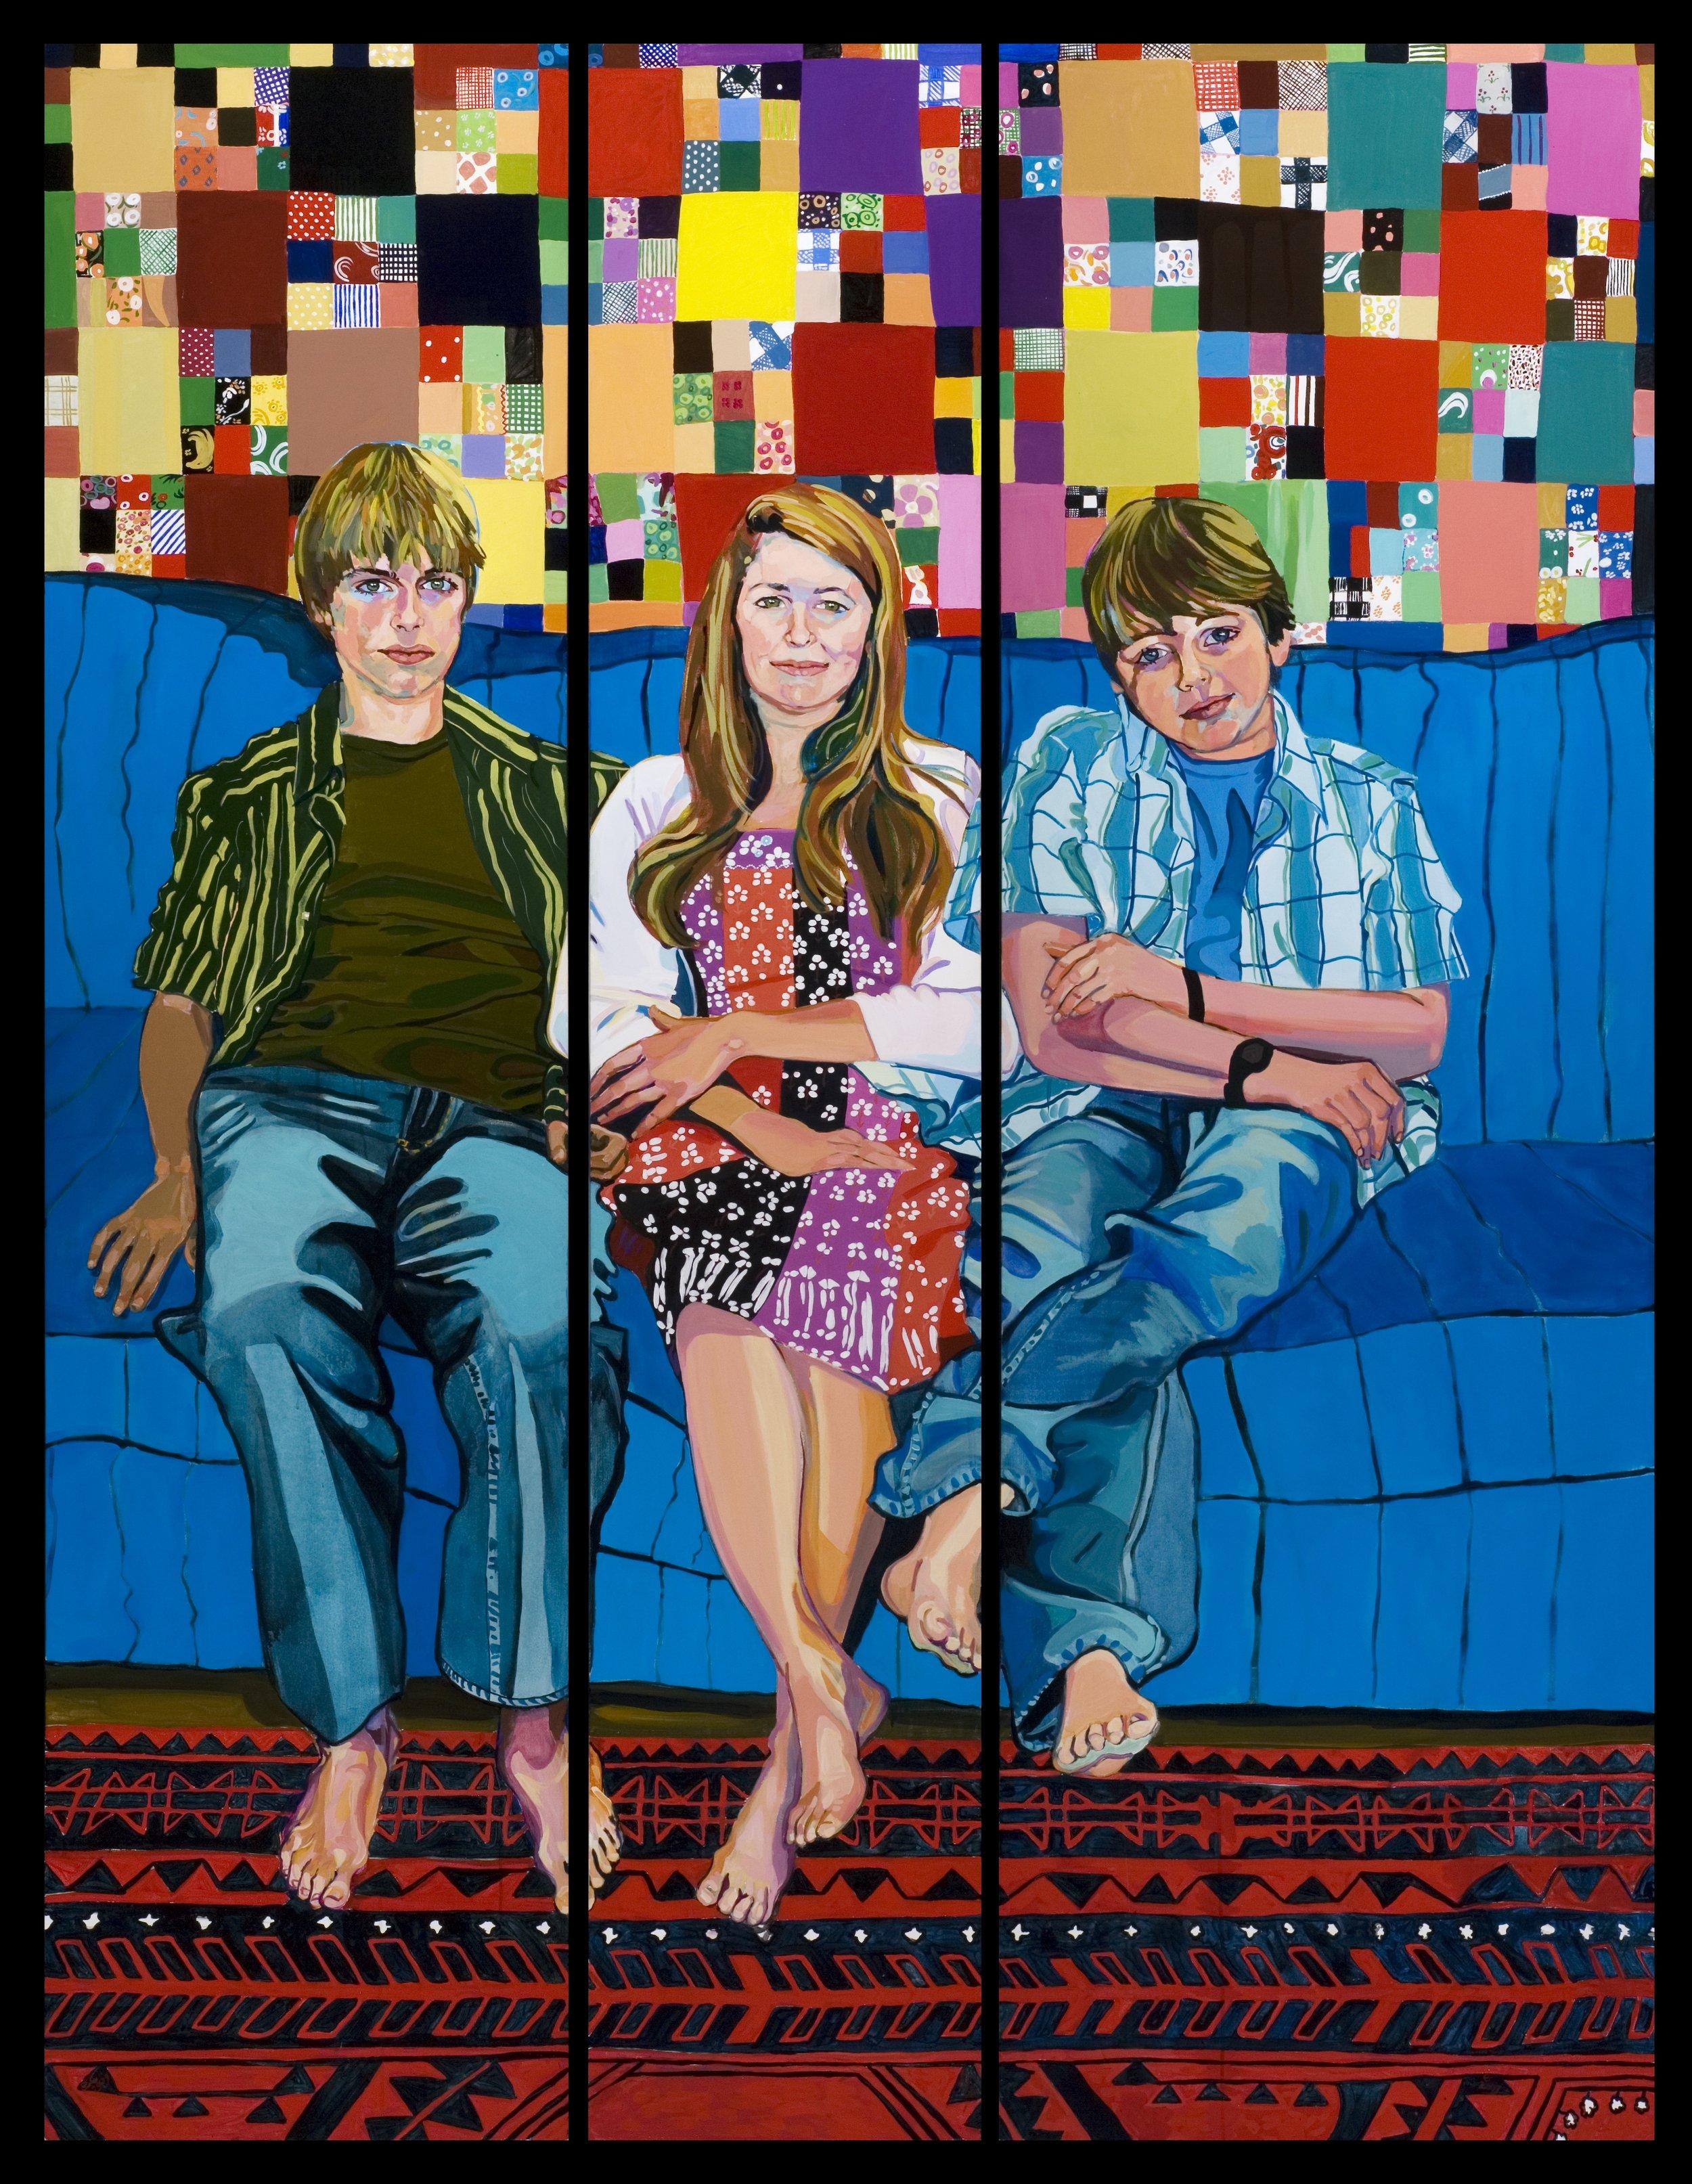 Norris triptych